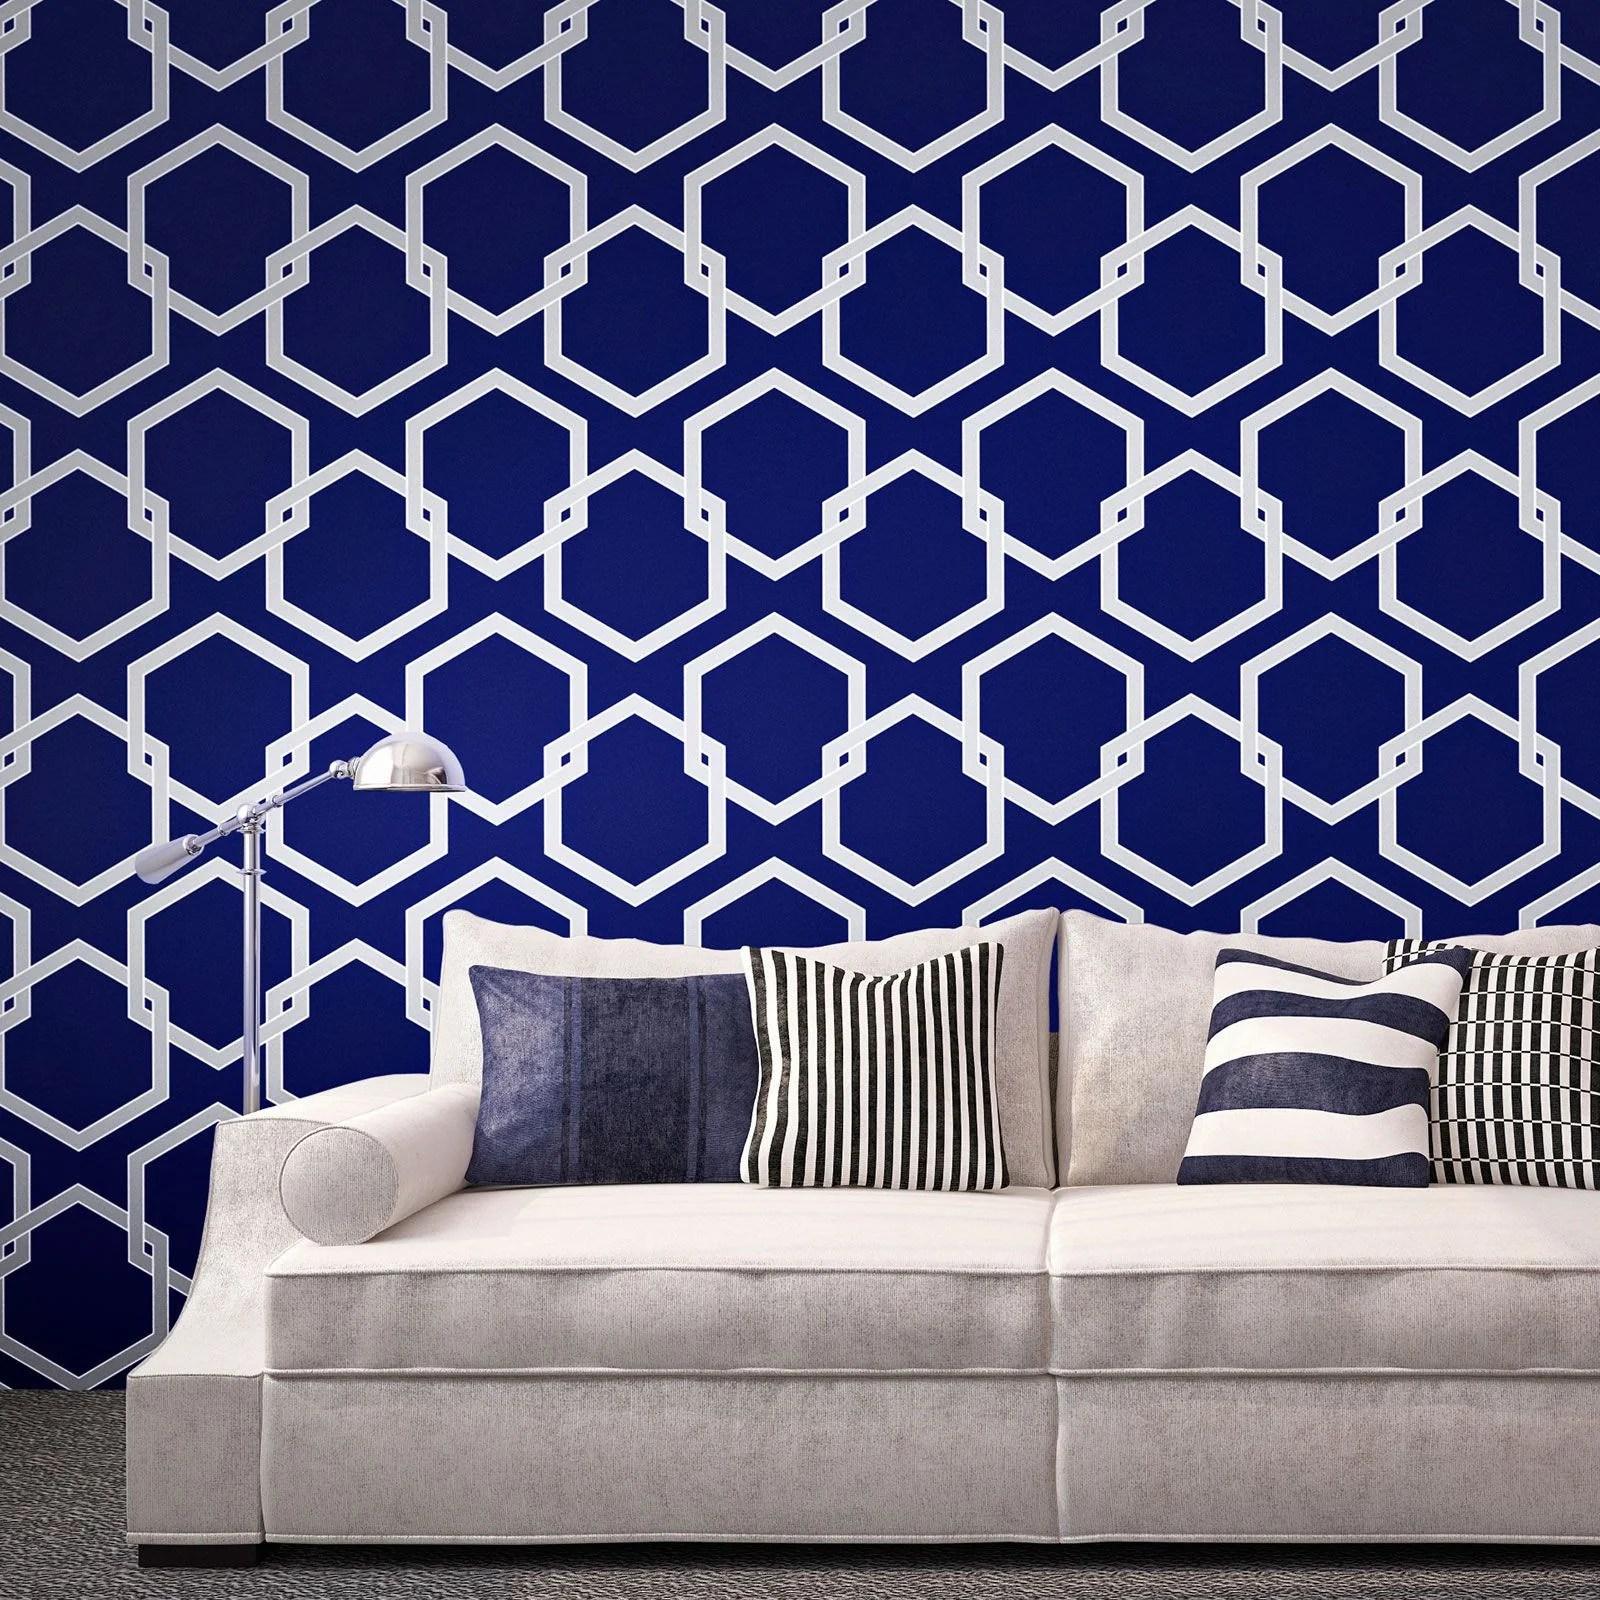 Temporary Wallpaper - Honey Comb - Metallic Silver/Deep Blue– Dormify